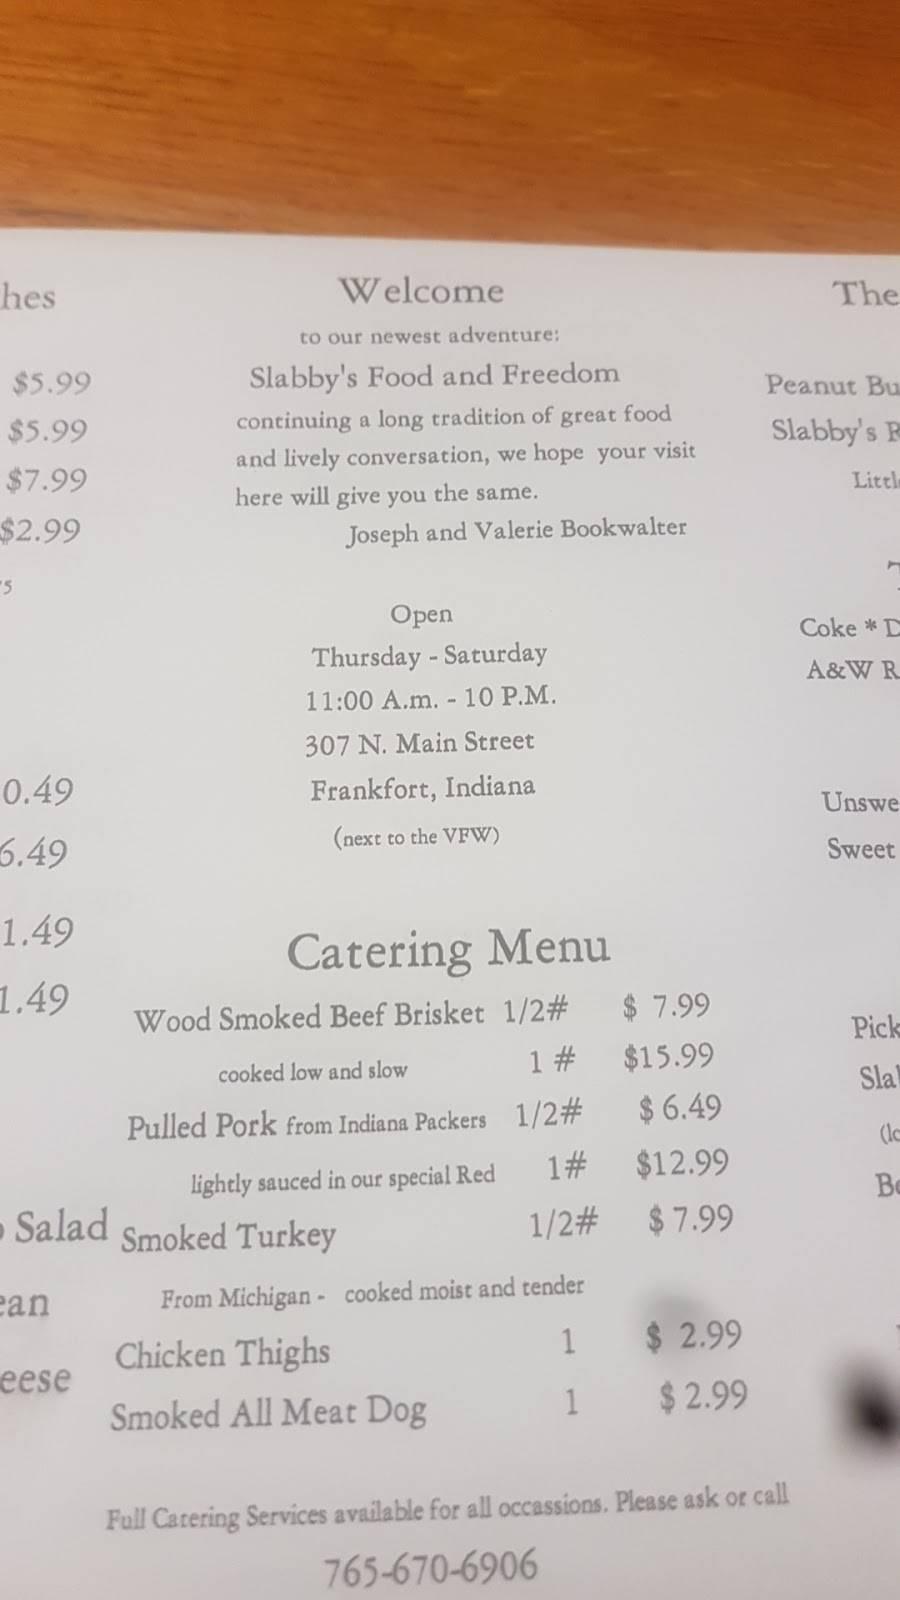 Slabbys Fun & Freedom   restaurant   307 N Main St, Frankfort, IN 46041, USA   7656706906 OR +1 765-670-6906